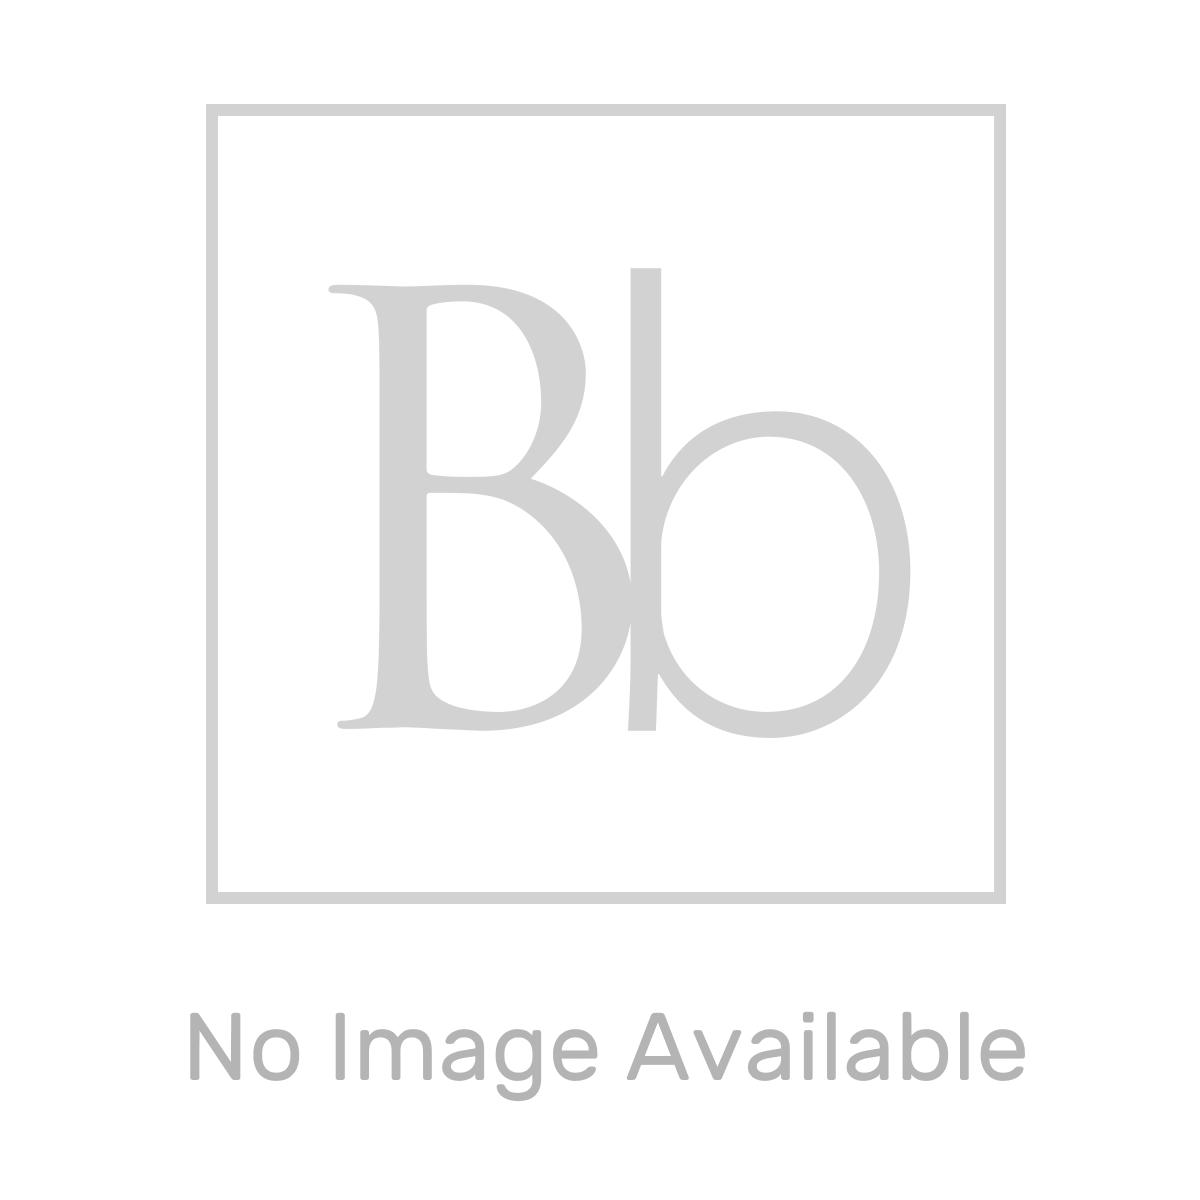 Croydex White L Shaped Telescopic Shower Curtain Rail